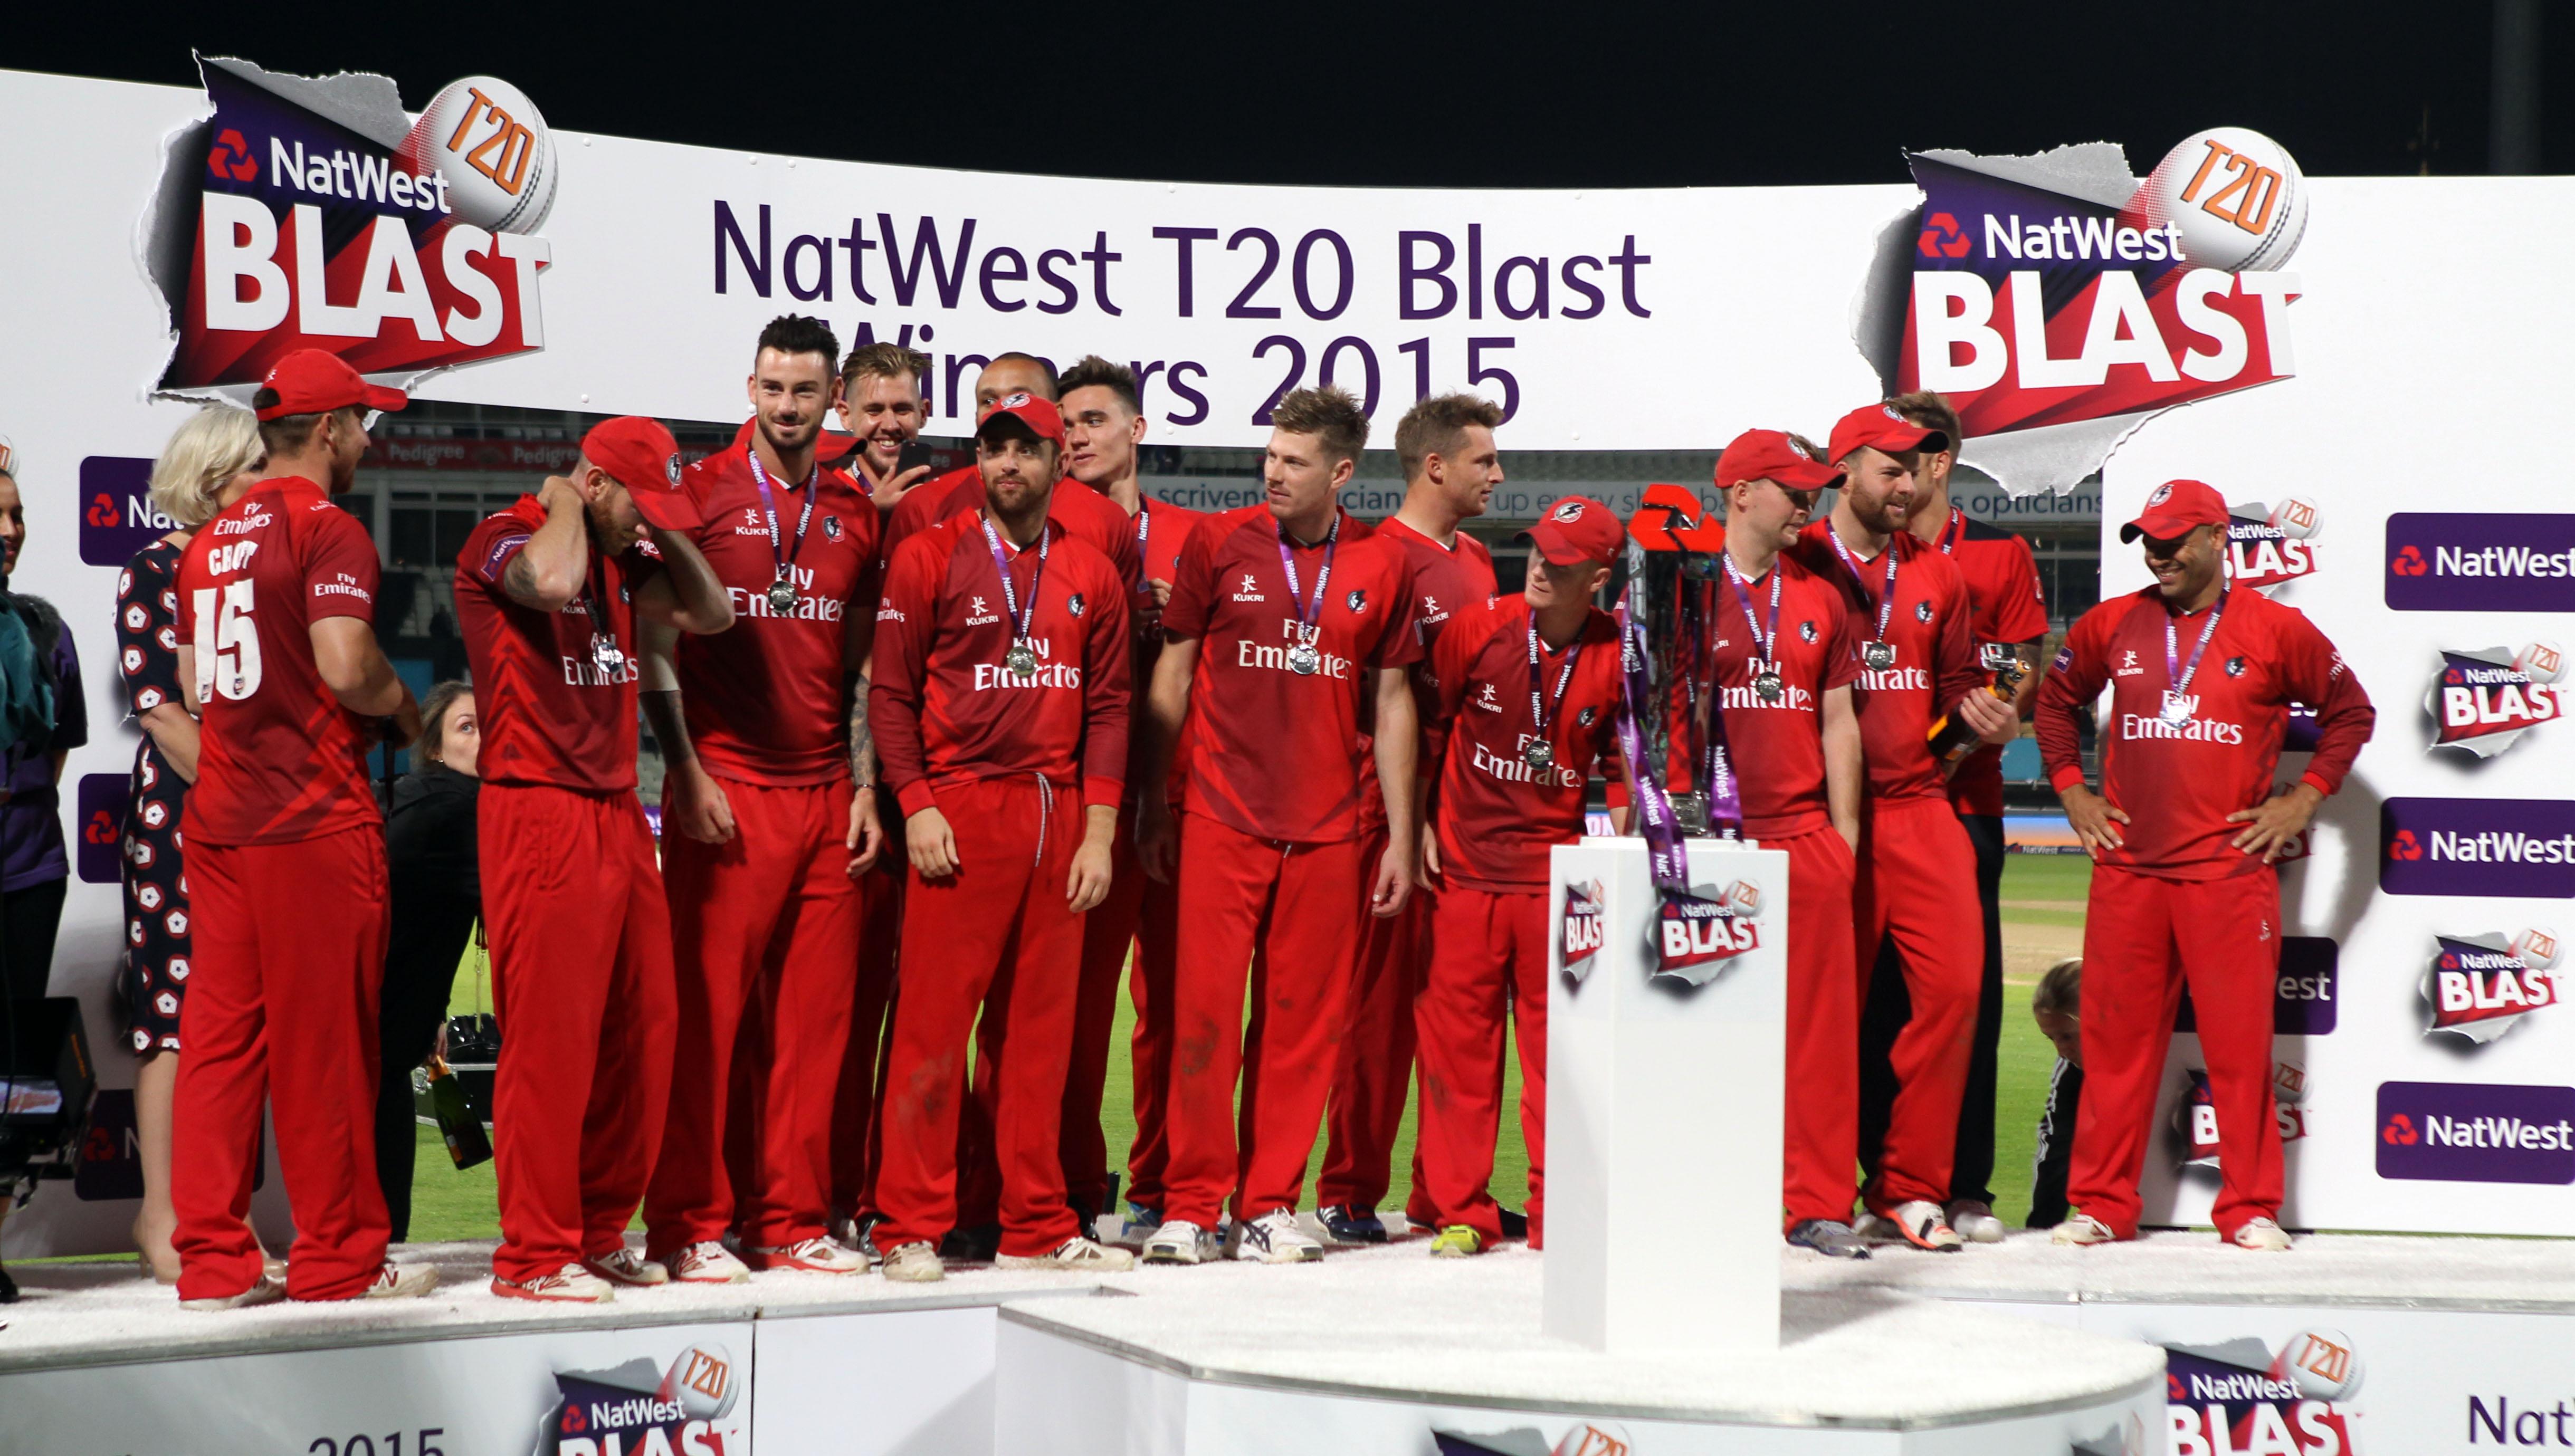 Winners Nat West t20 Blast Finals day Edgbaston LANCASHIRE COUNTY CRICKET CLUB V  Northants 29/08/15